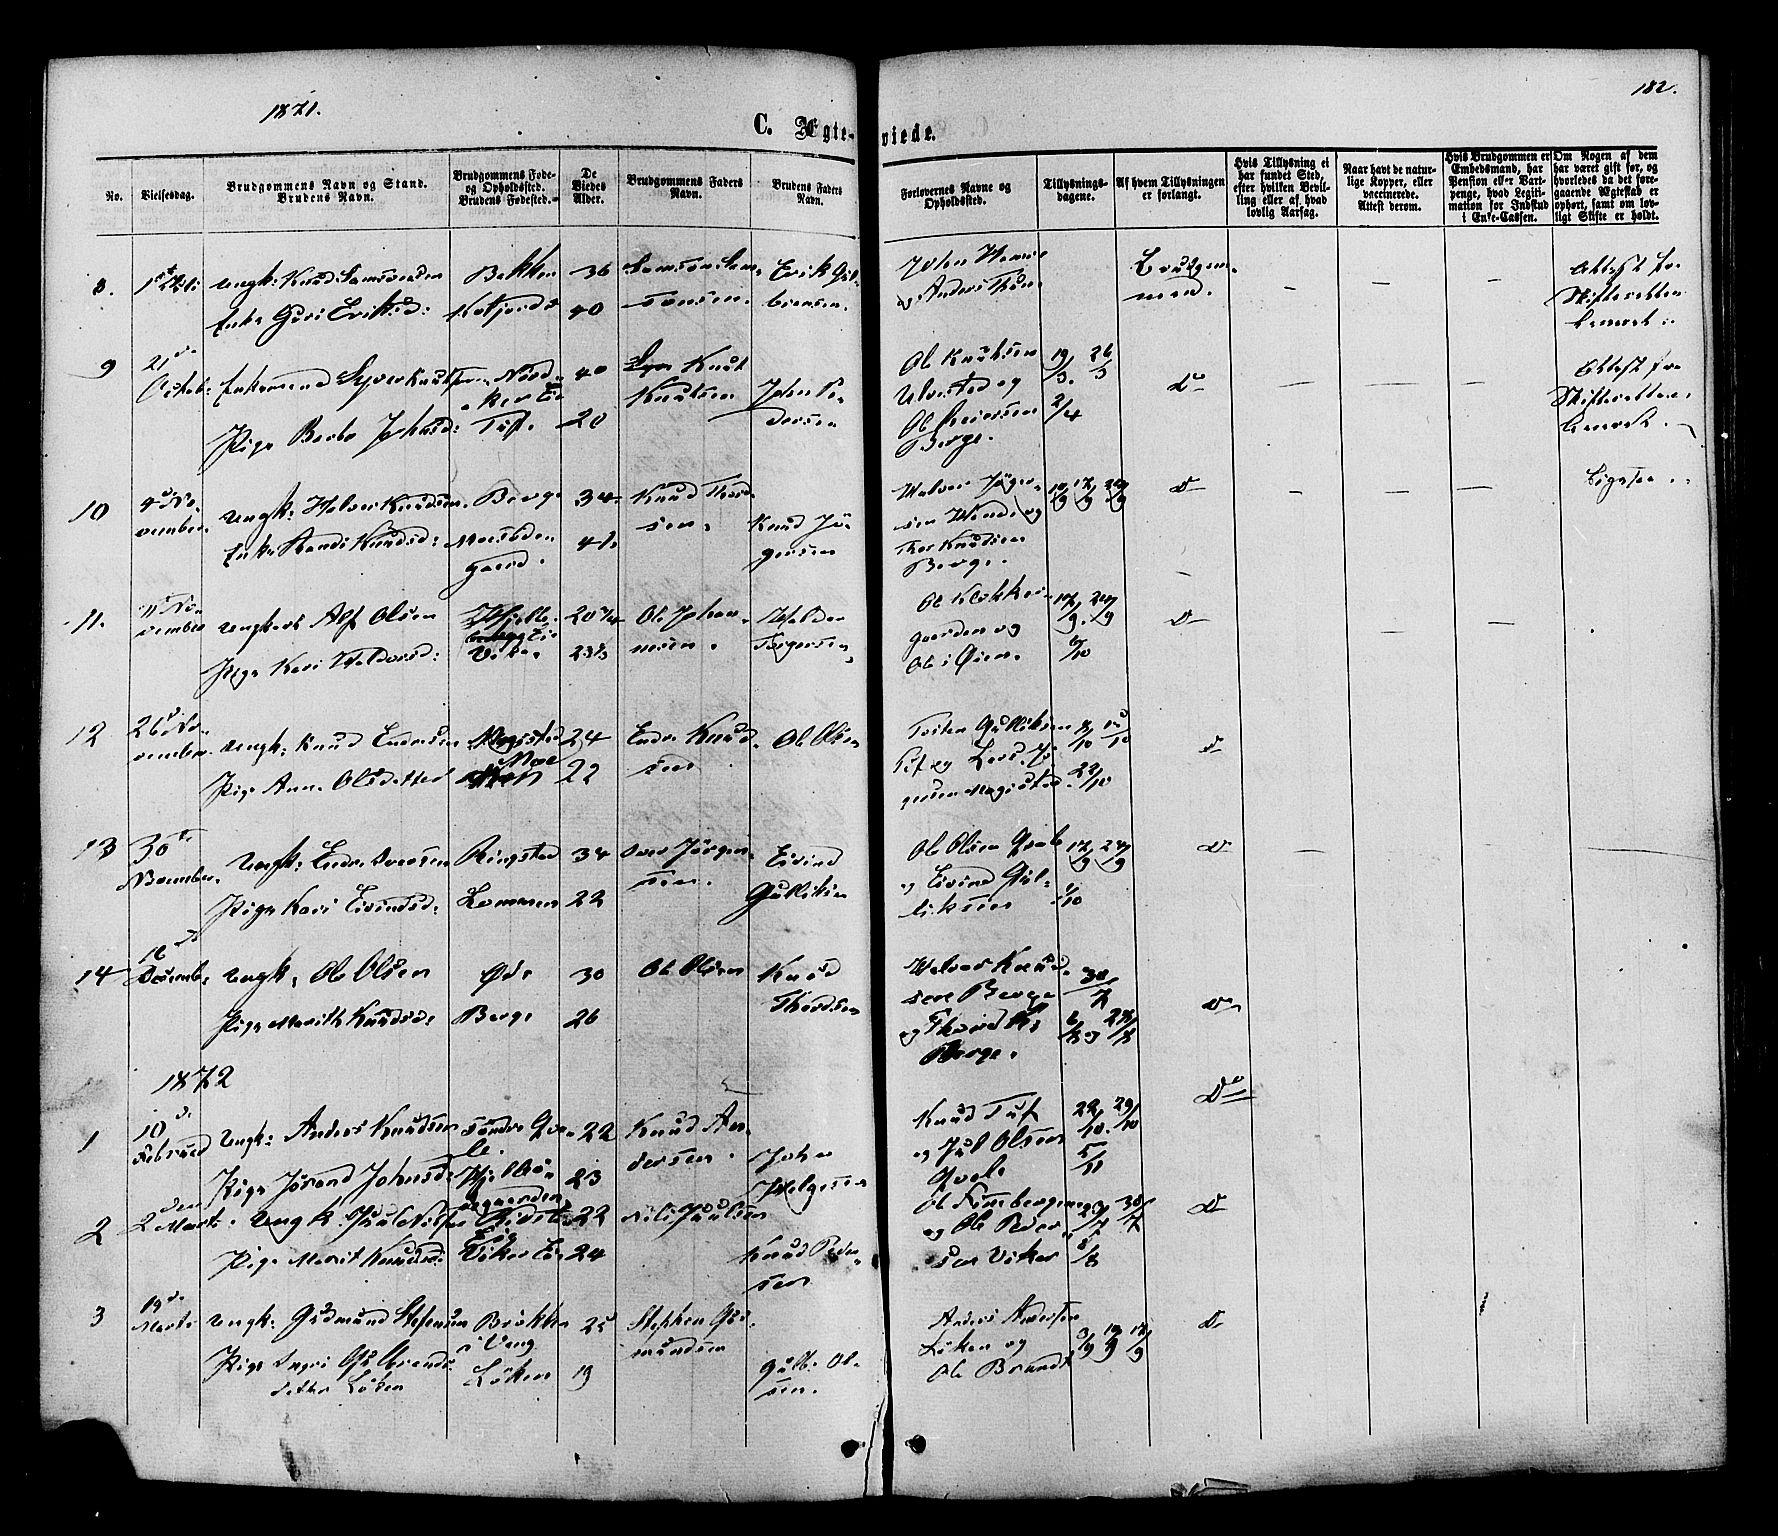 SAH, Vestre Slidre prestekontor, Ministerialbok nr. 3, 1865-1880, s. 182